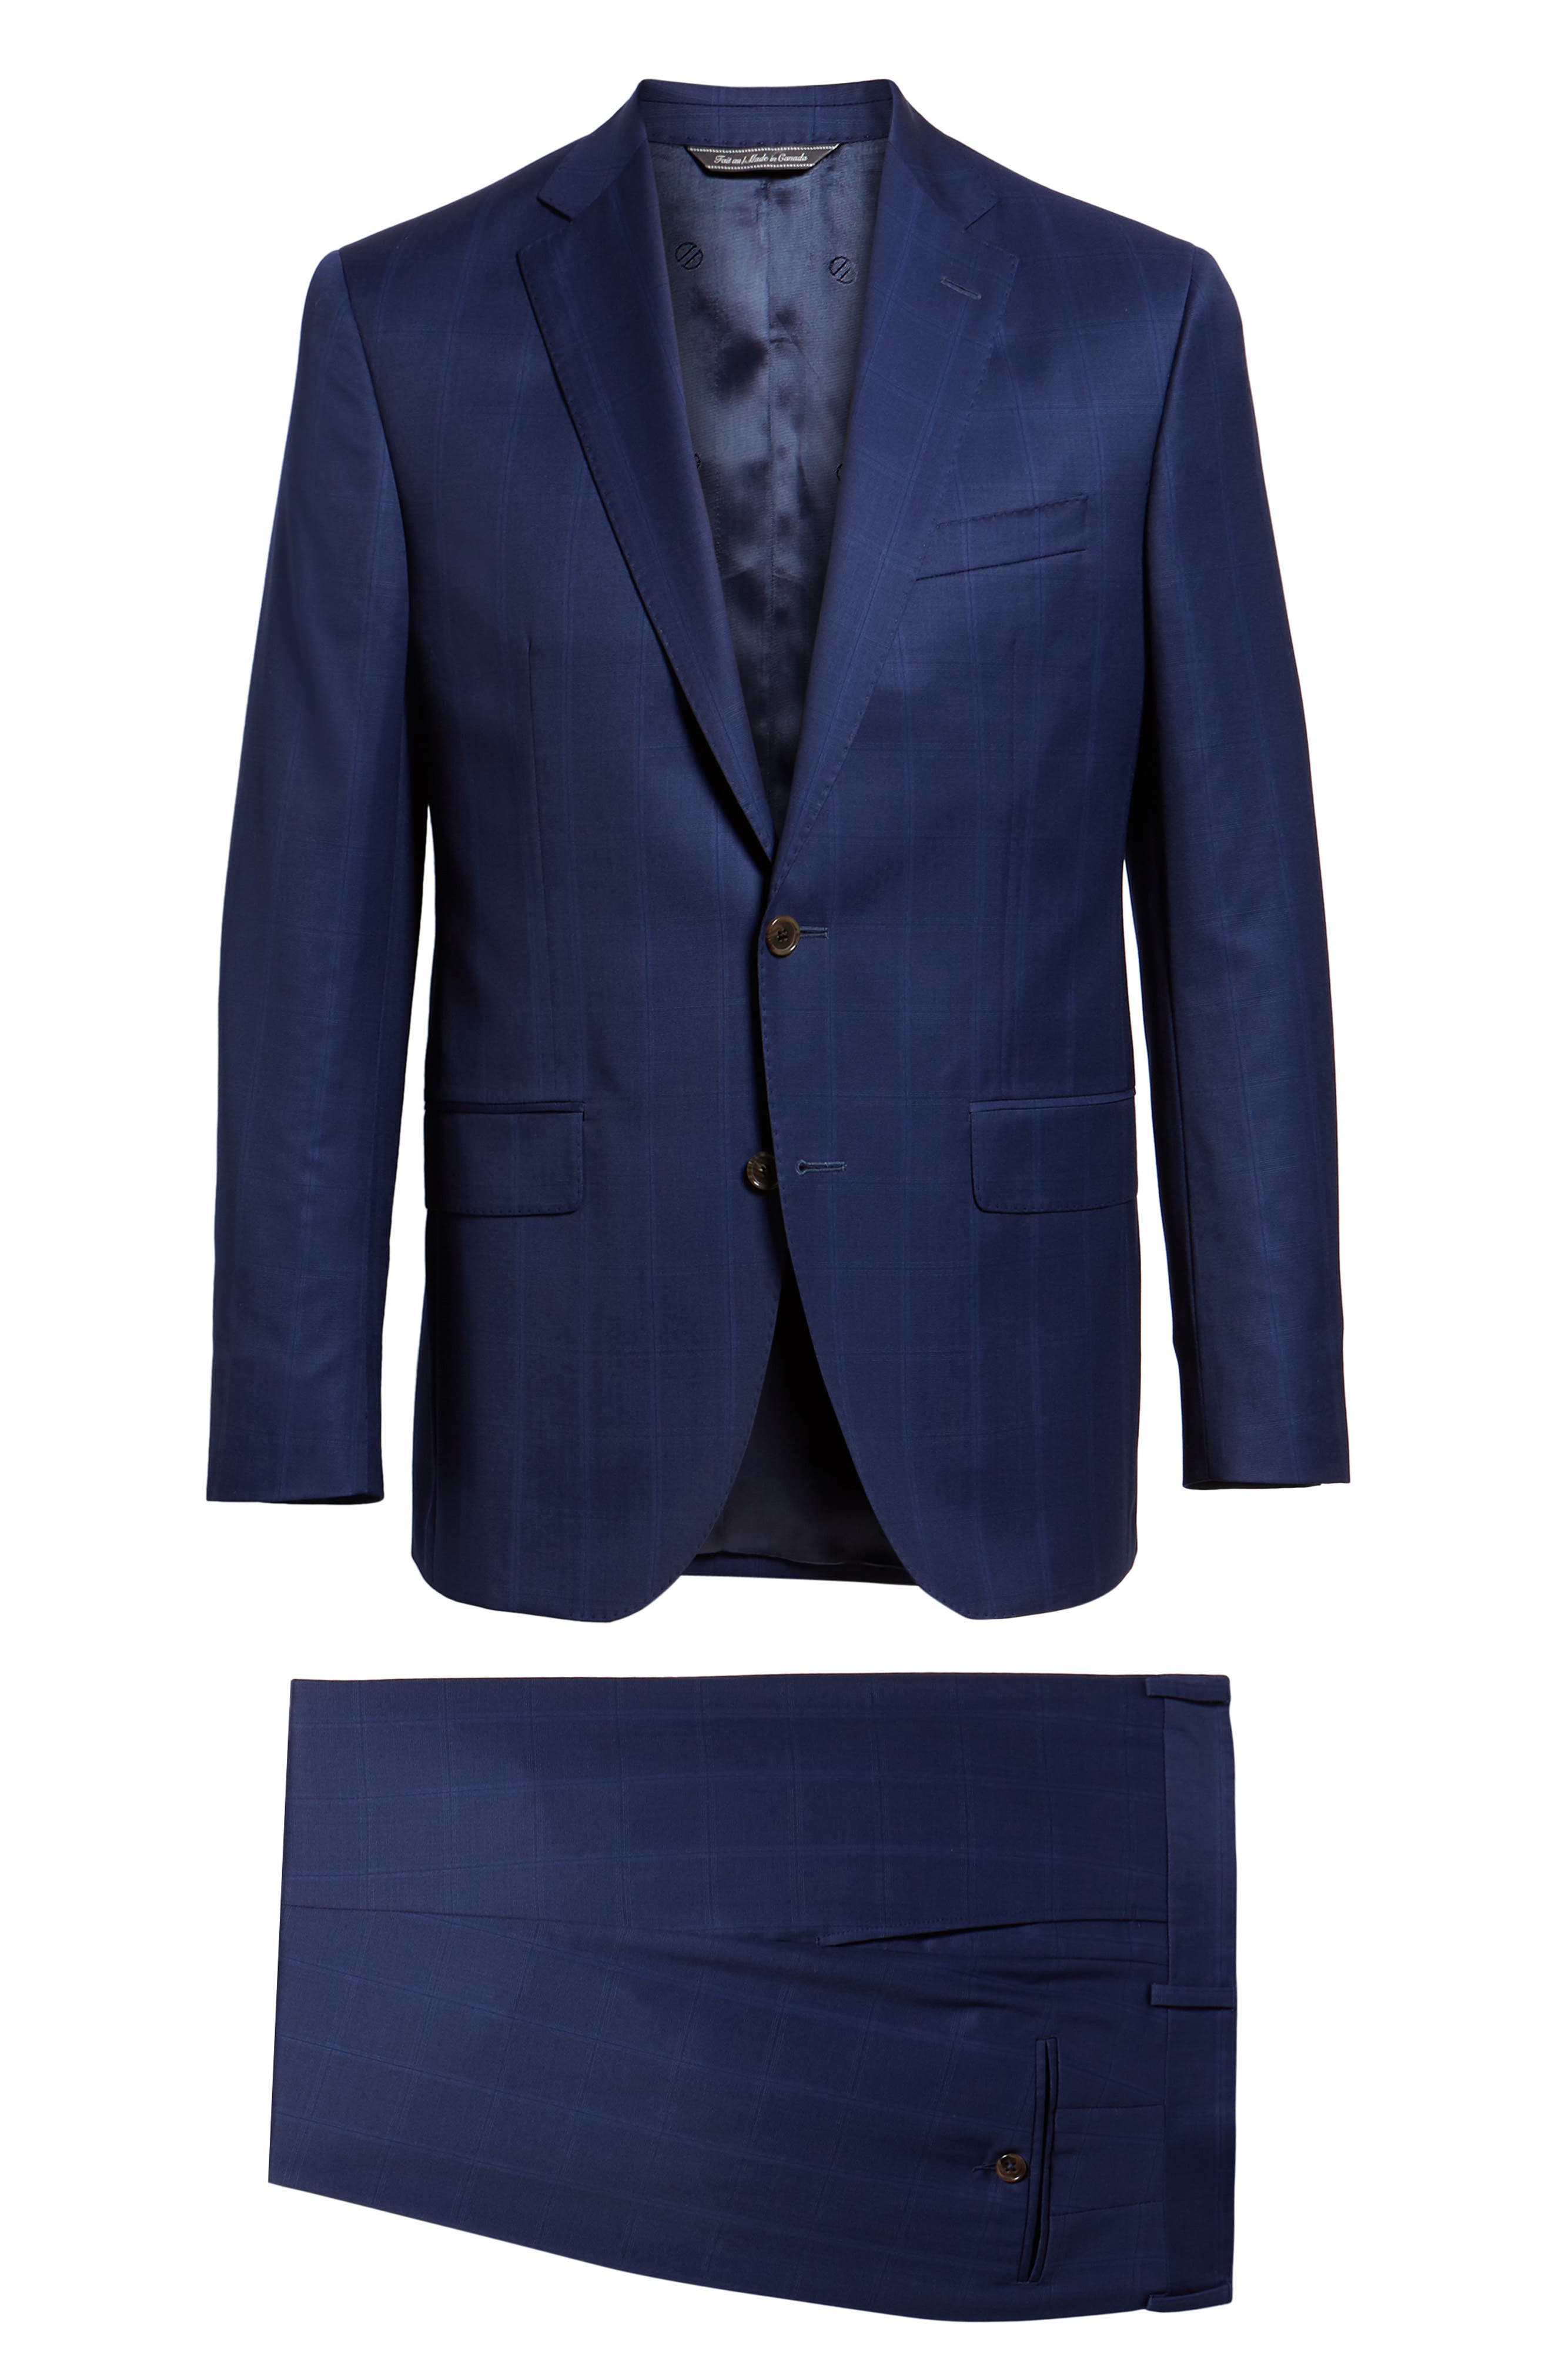 DAVID DONAHUE,                             Ryan Classic Fit Windowpane Wool Suit,                             Alternate thumbnail 8, color,                             400